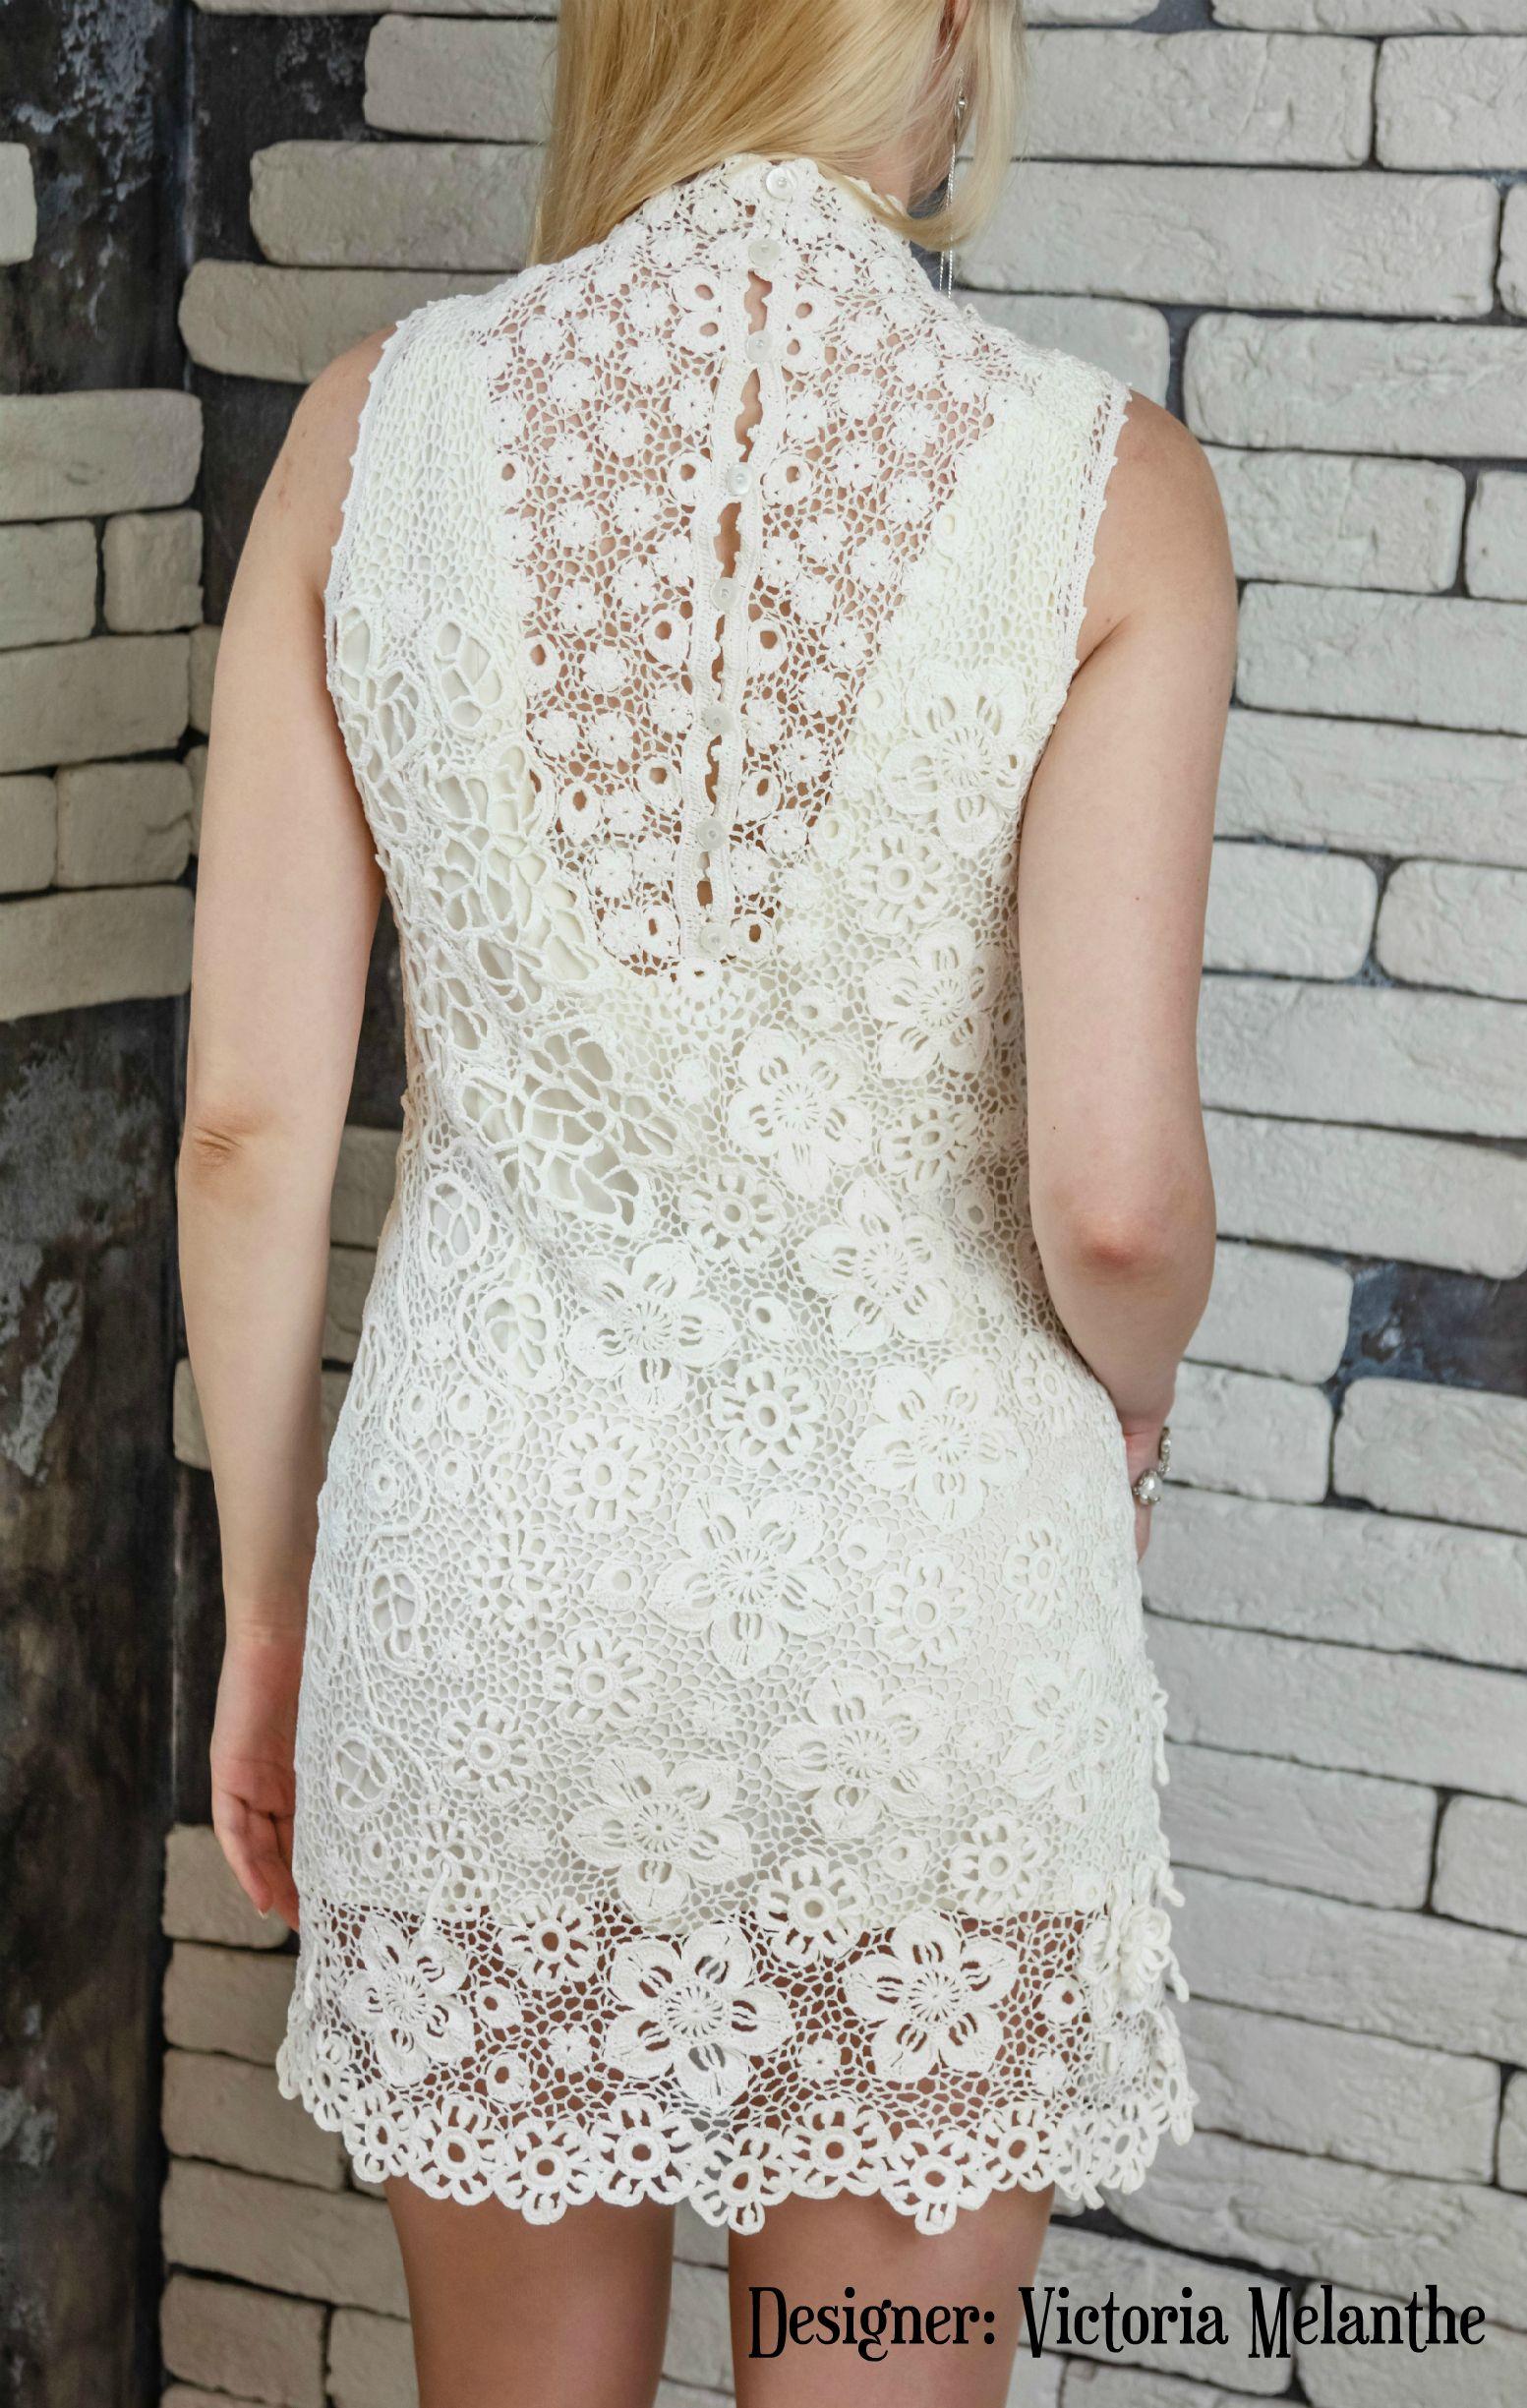 Wedding Lacy Dress Crochet Irish Lace Crochet Short Wedding Dress Irish Lace Wedding Dres Crochet Wedding Dresses White Short Dress Irish Lace Wedding Dress [ 2449 x 1553 Pixel ]